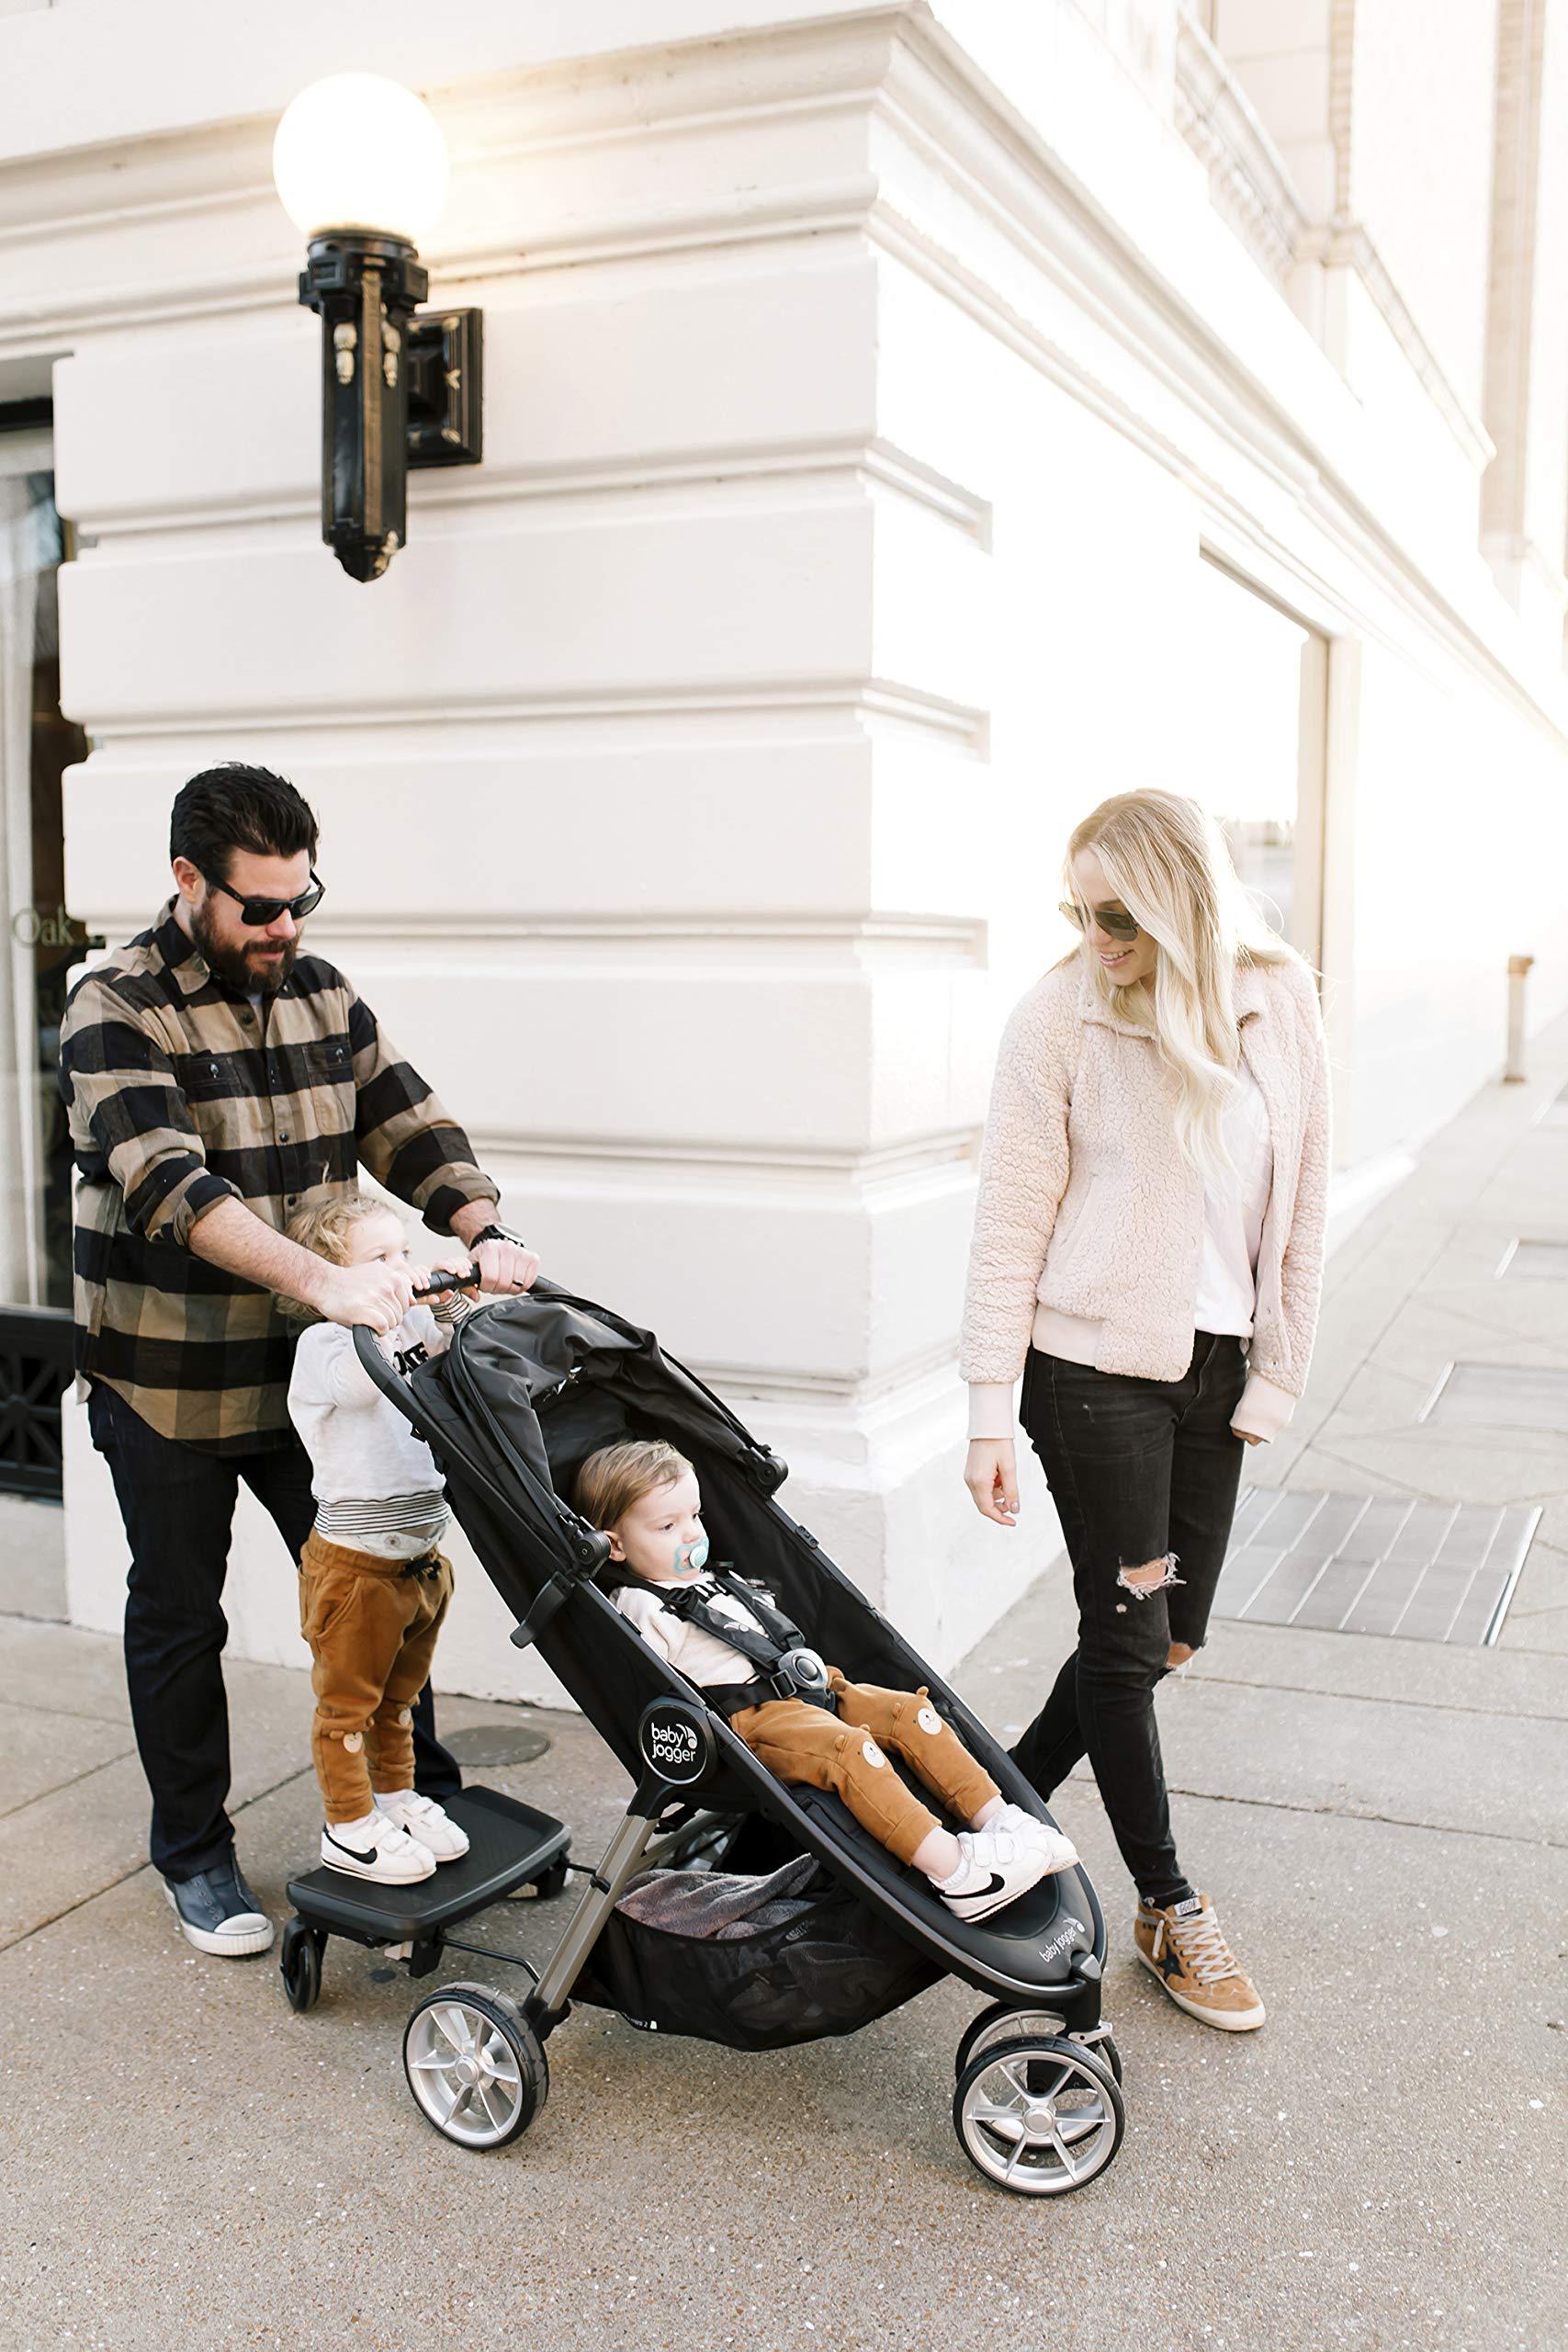 Baby Jogger City Mini 2 Stroller - 2019   Compact, Lightweight Stroller   Quick Fold Baby Stroller, Carbon by Baby Jogger (Image #9)